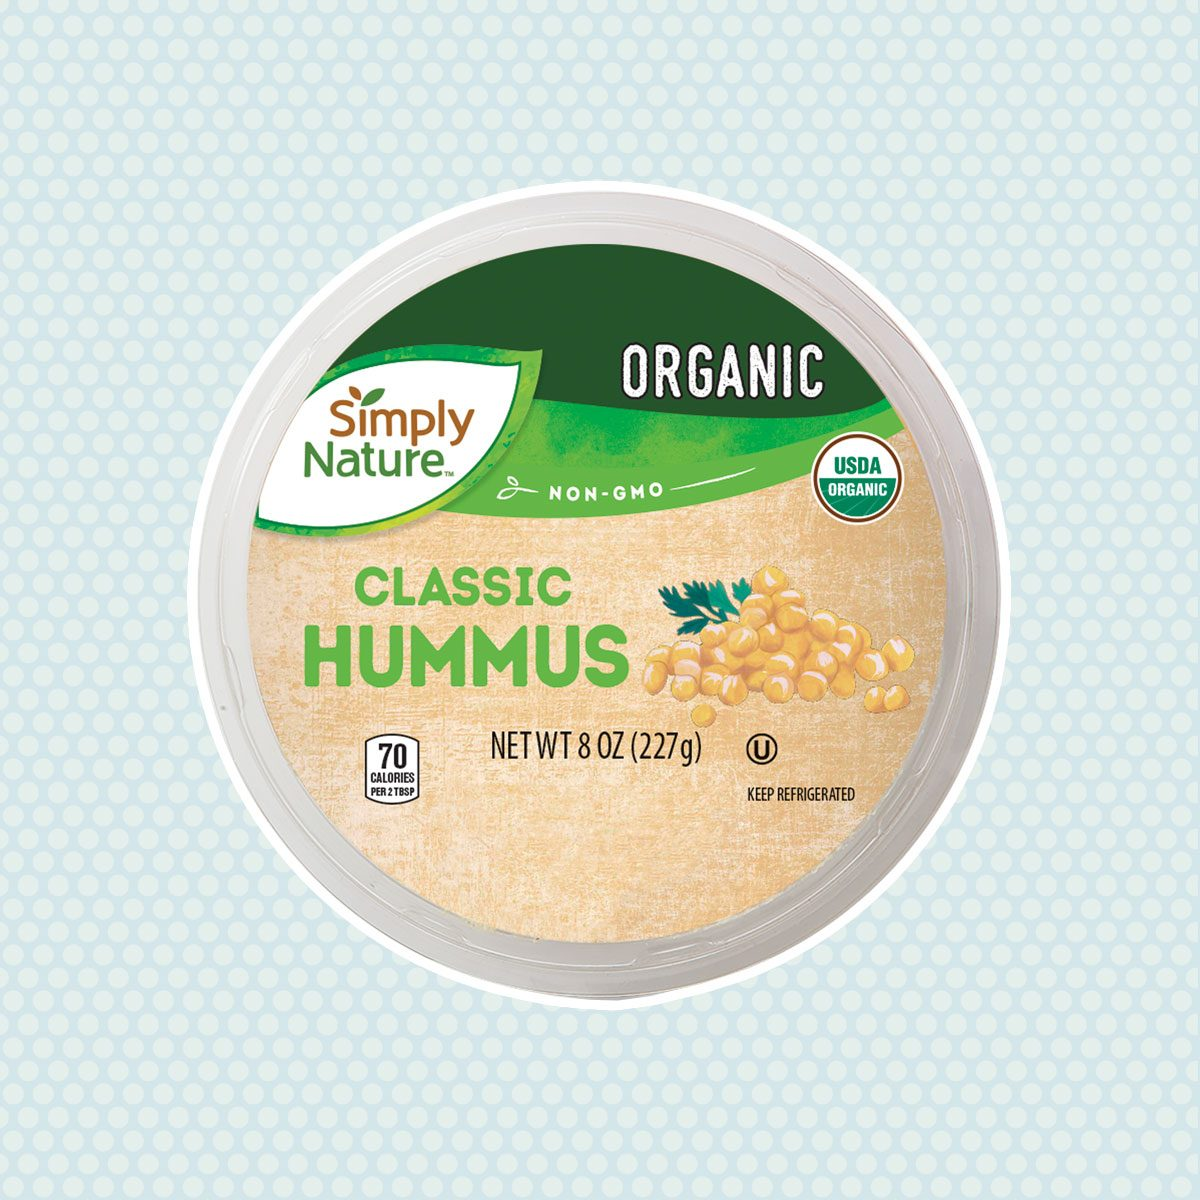 Simply Nature Organic Hummus